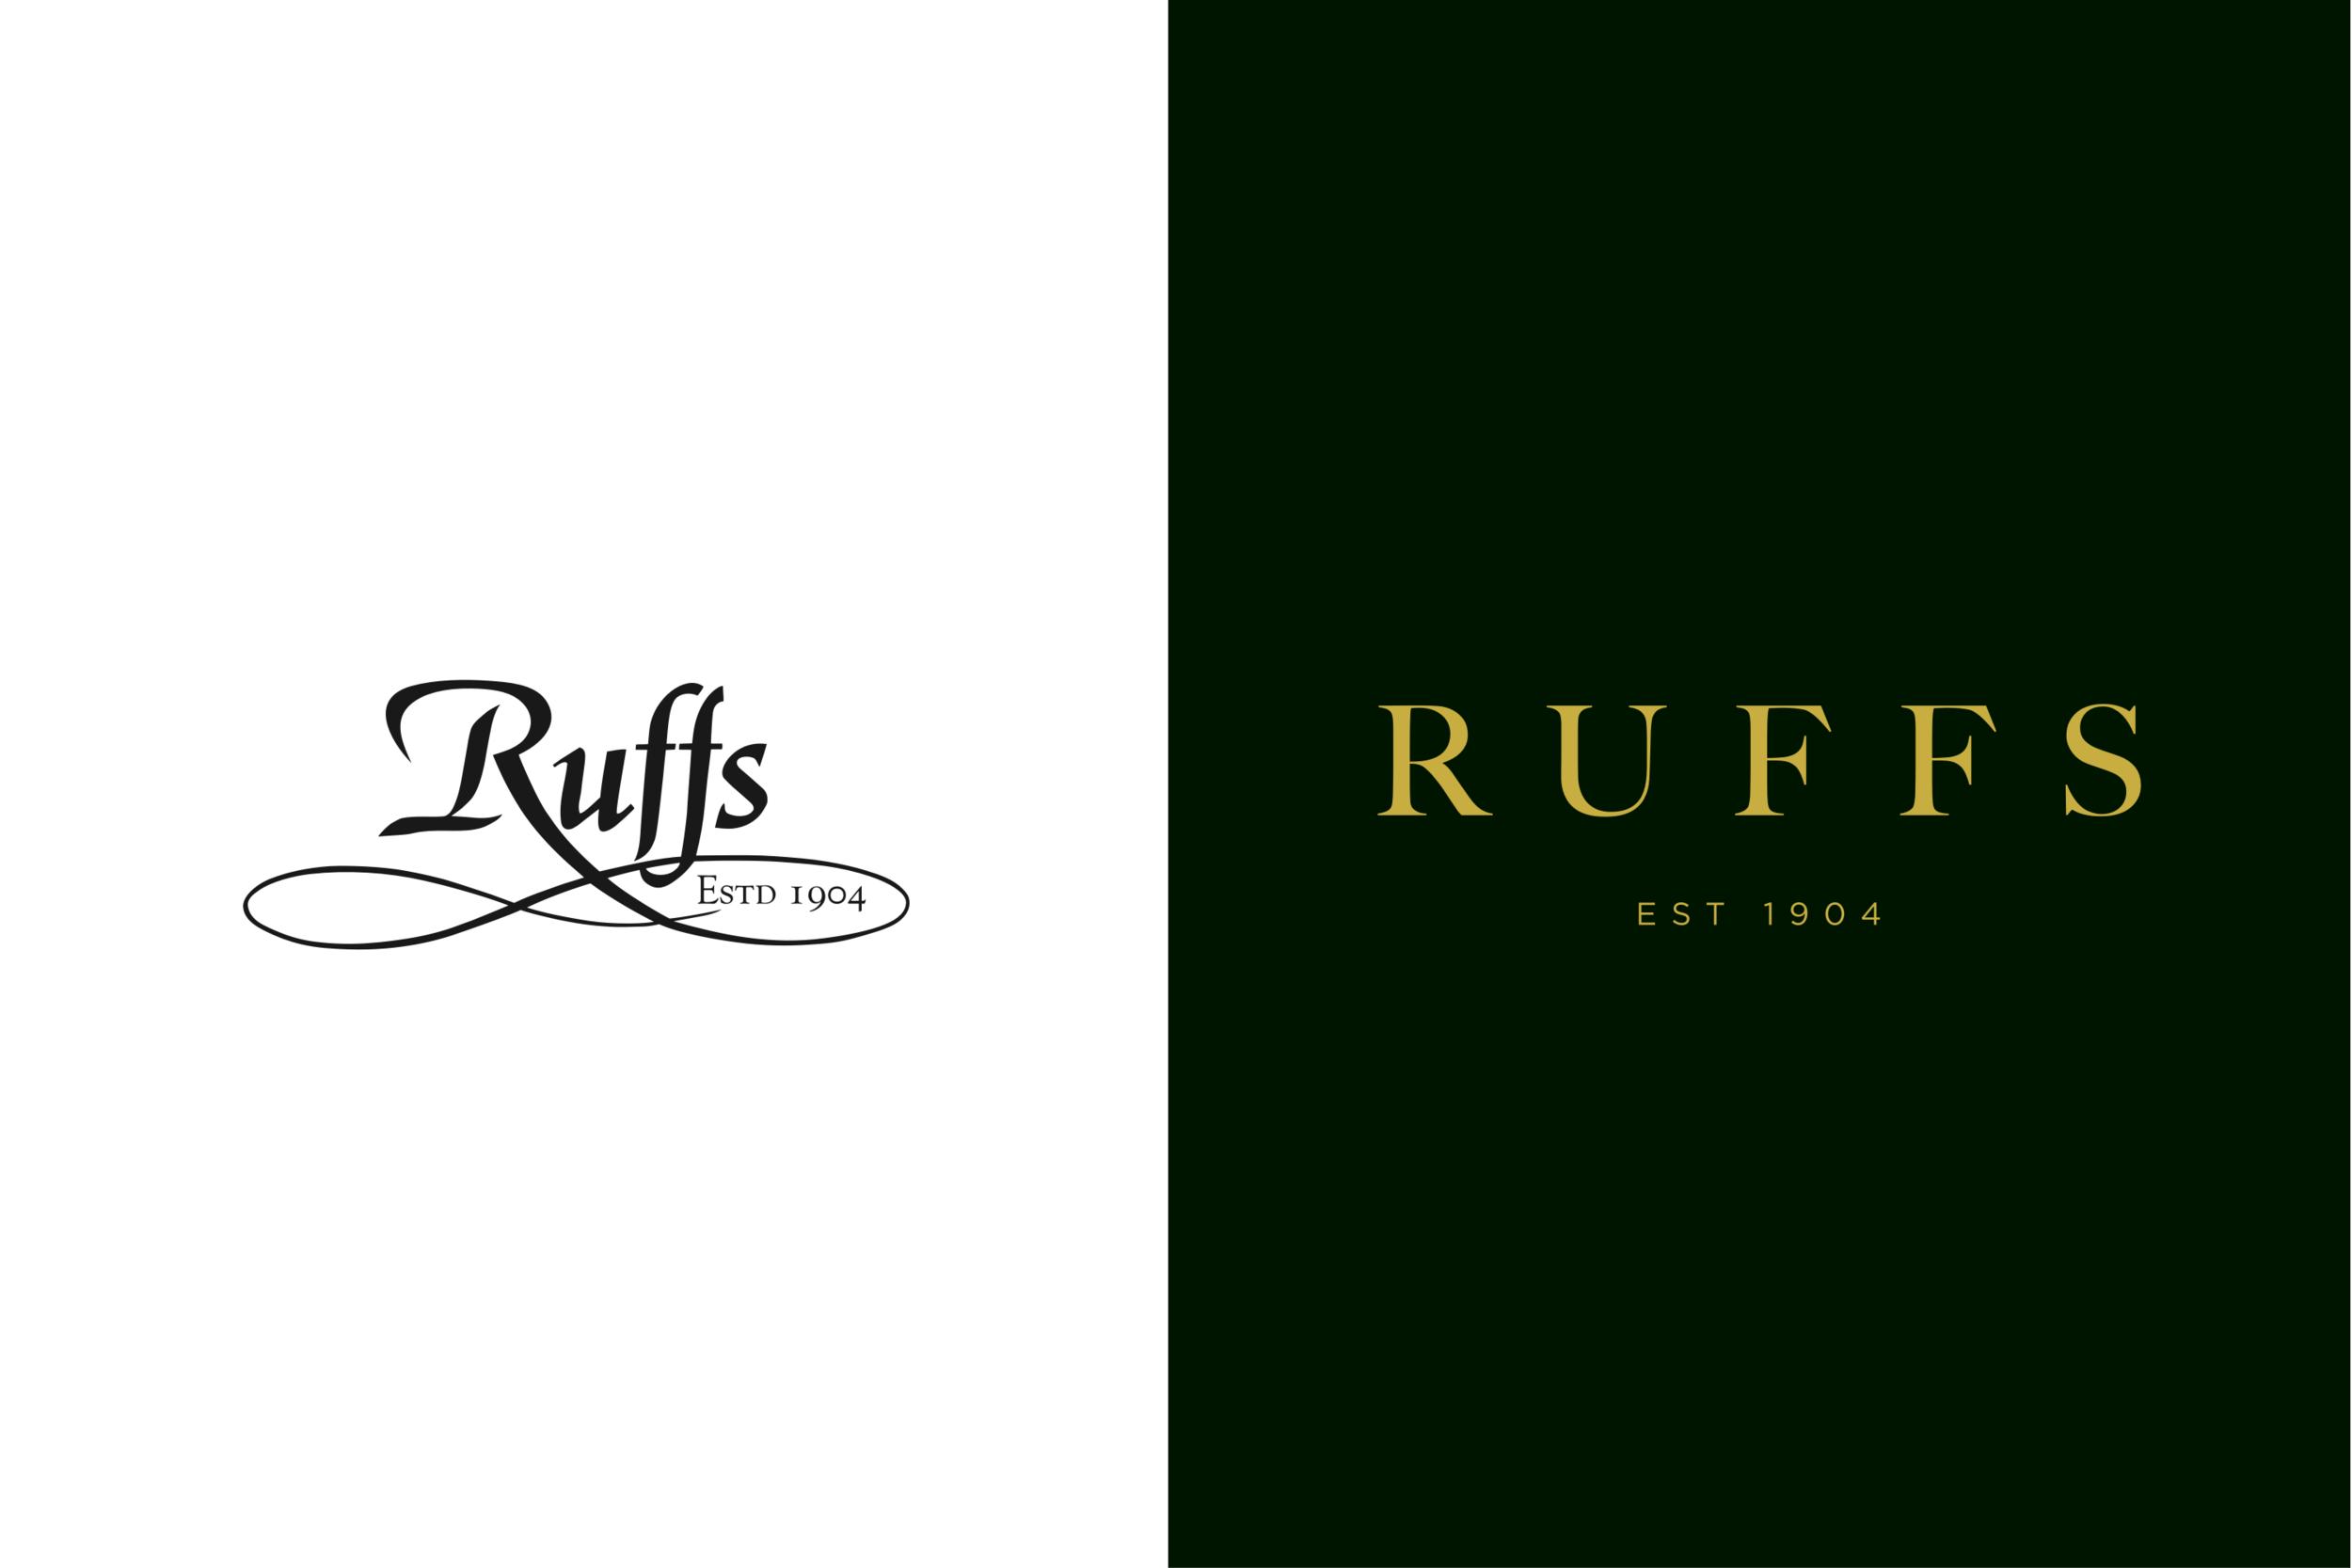 Ruffs 6.png